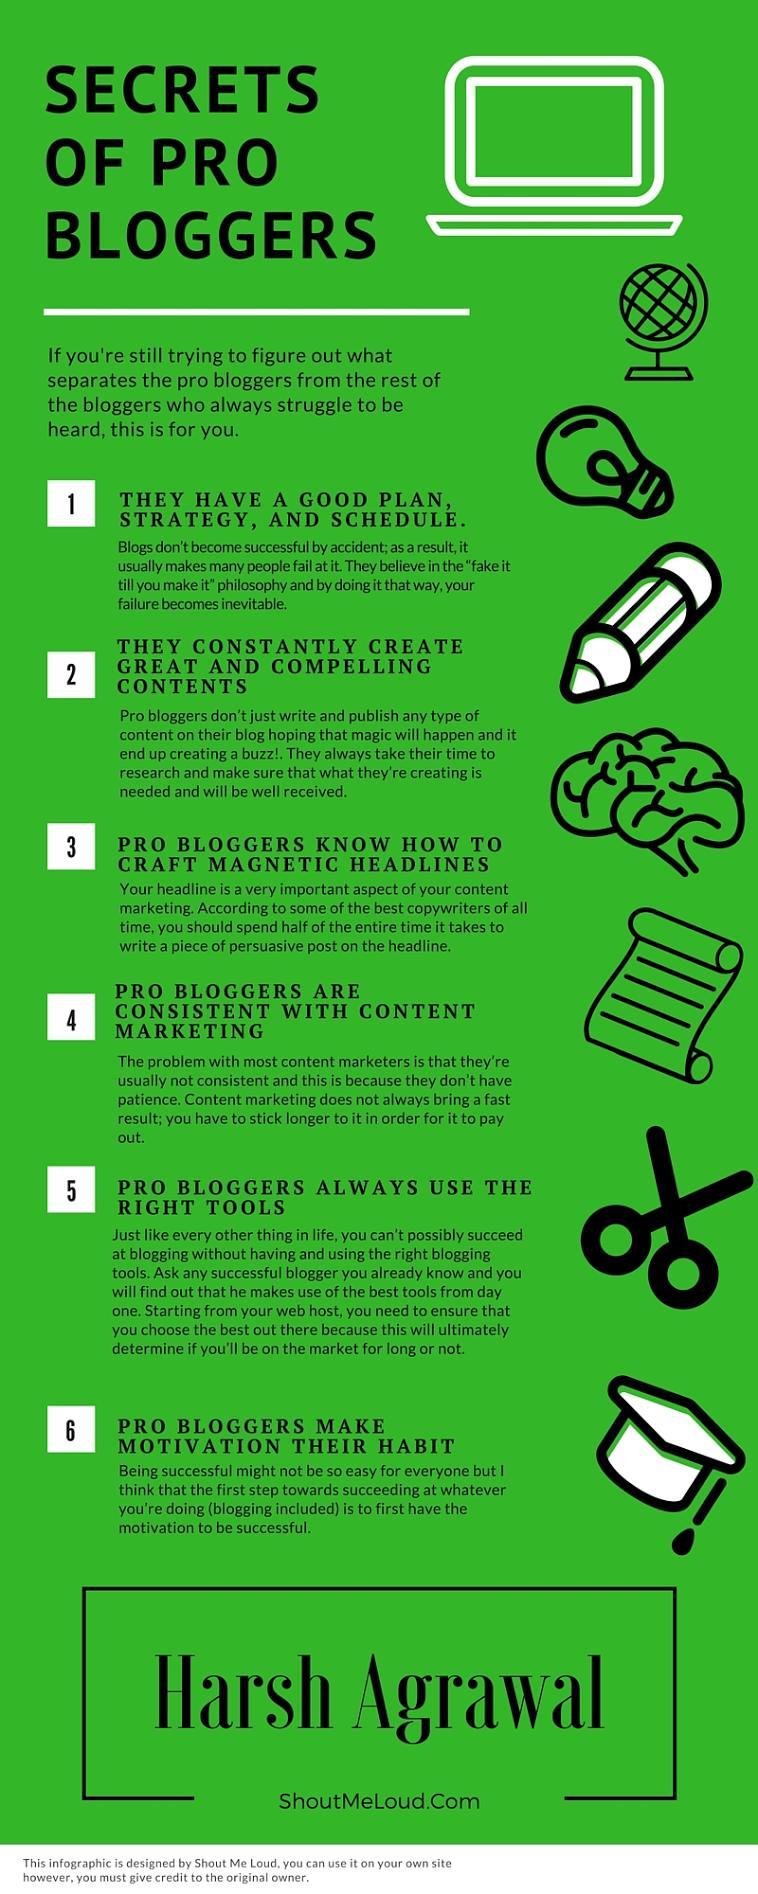 Secrets of Probloggers